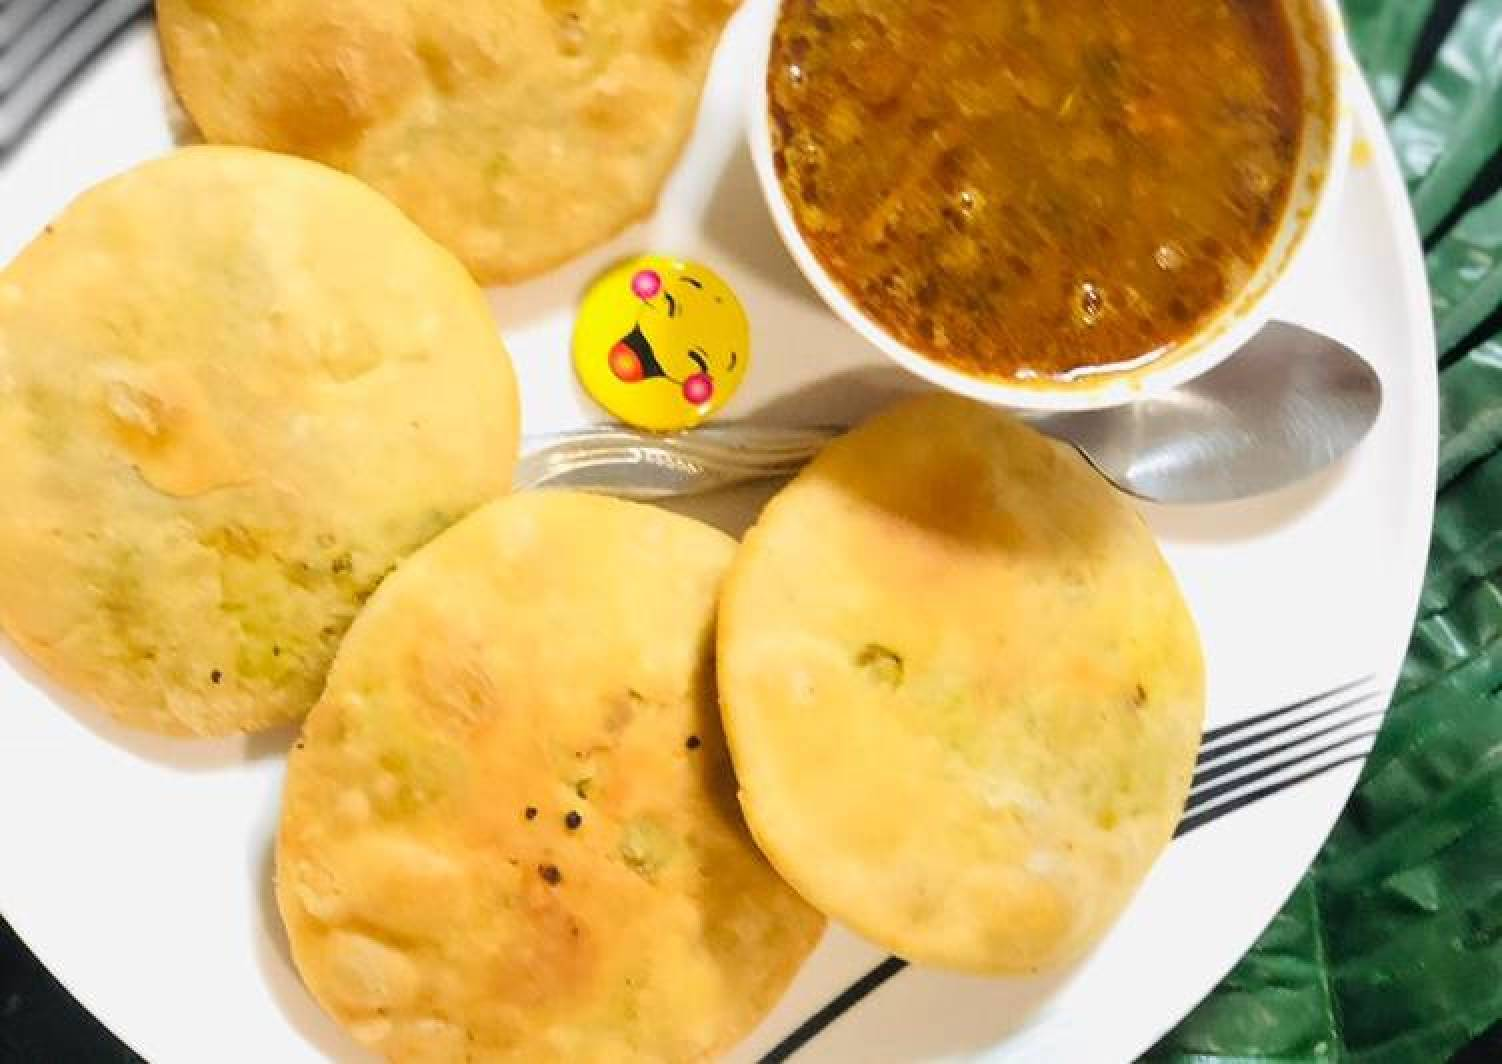 Khasta Kachori with Aloo ki sabji (Green peas stuffed patties)